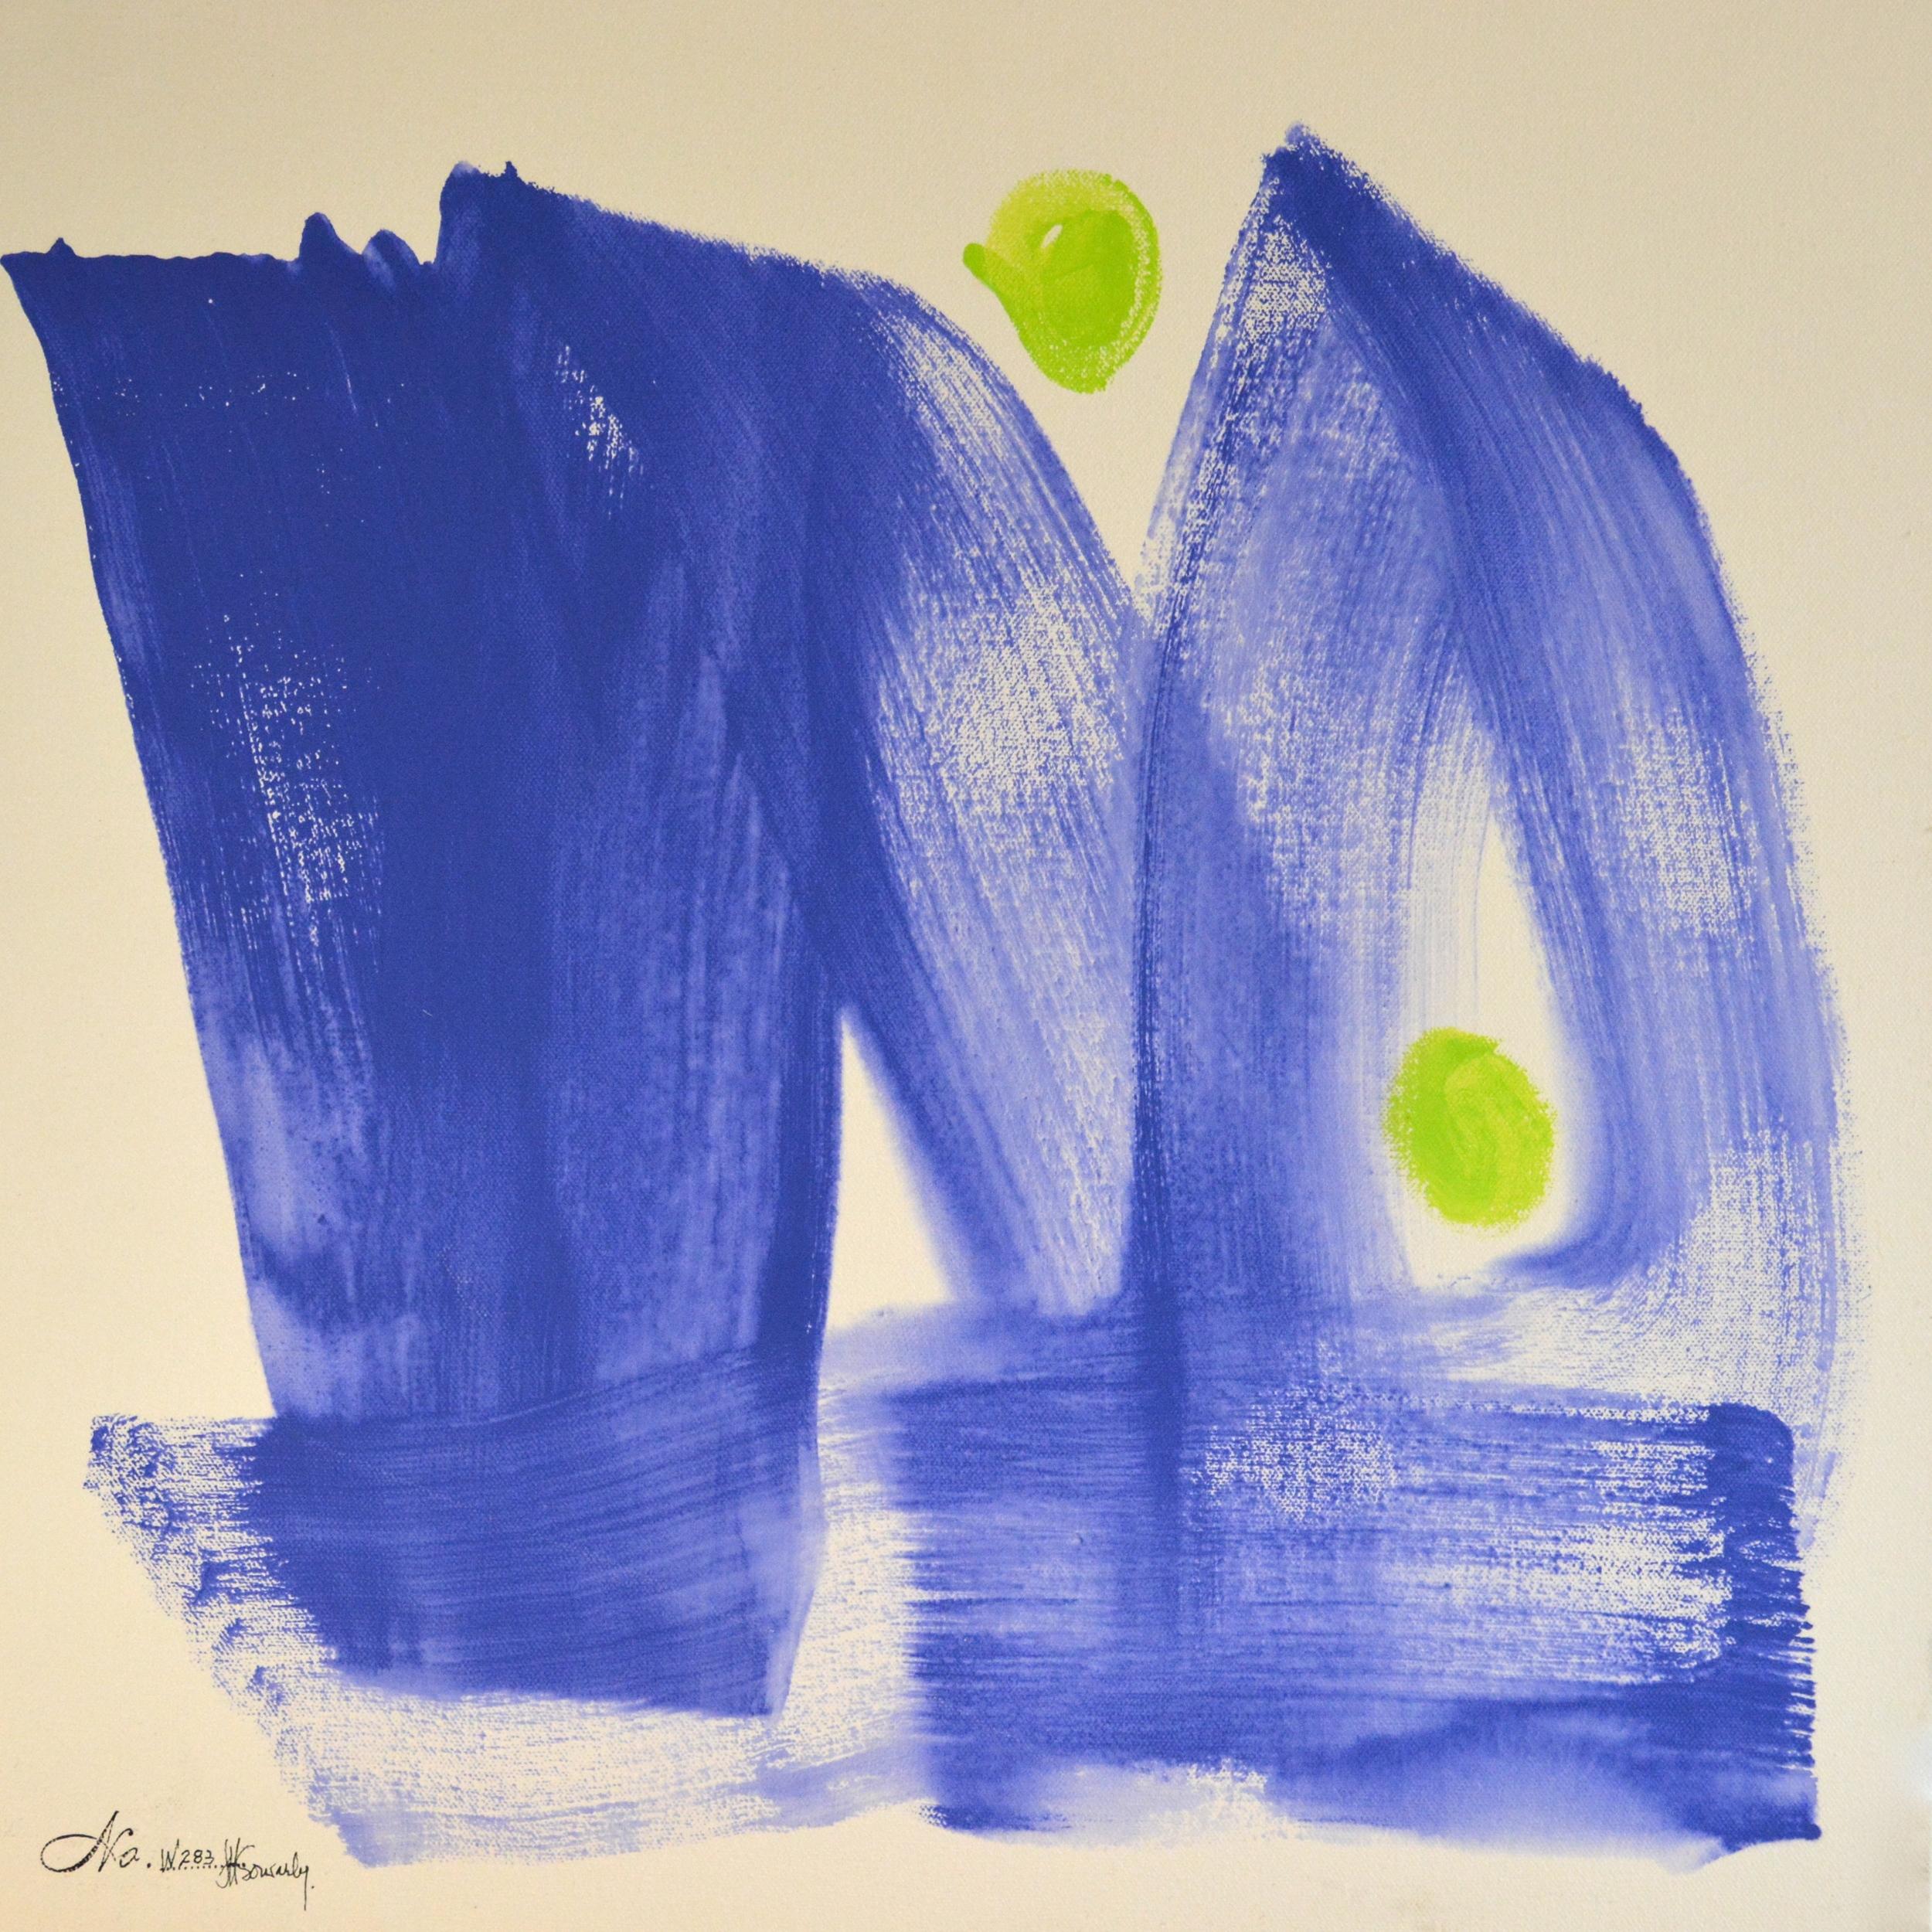 No.W283 Double Blue (12 x 12)